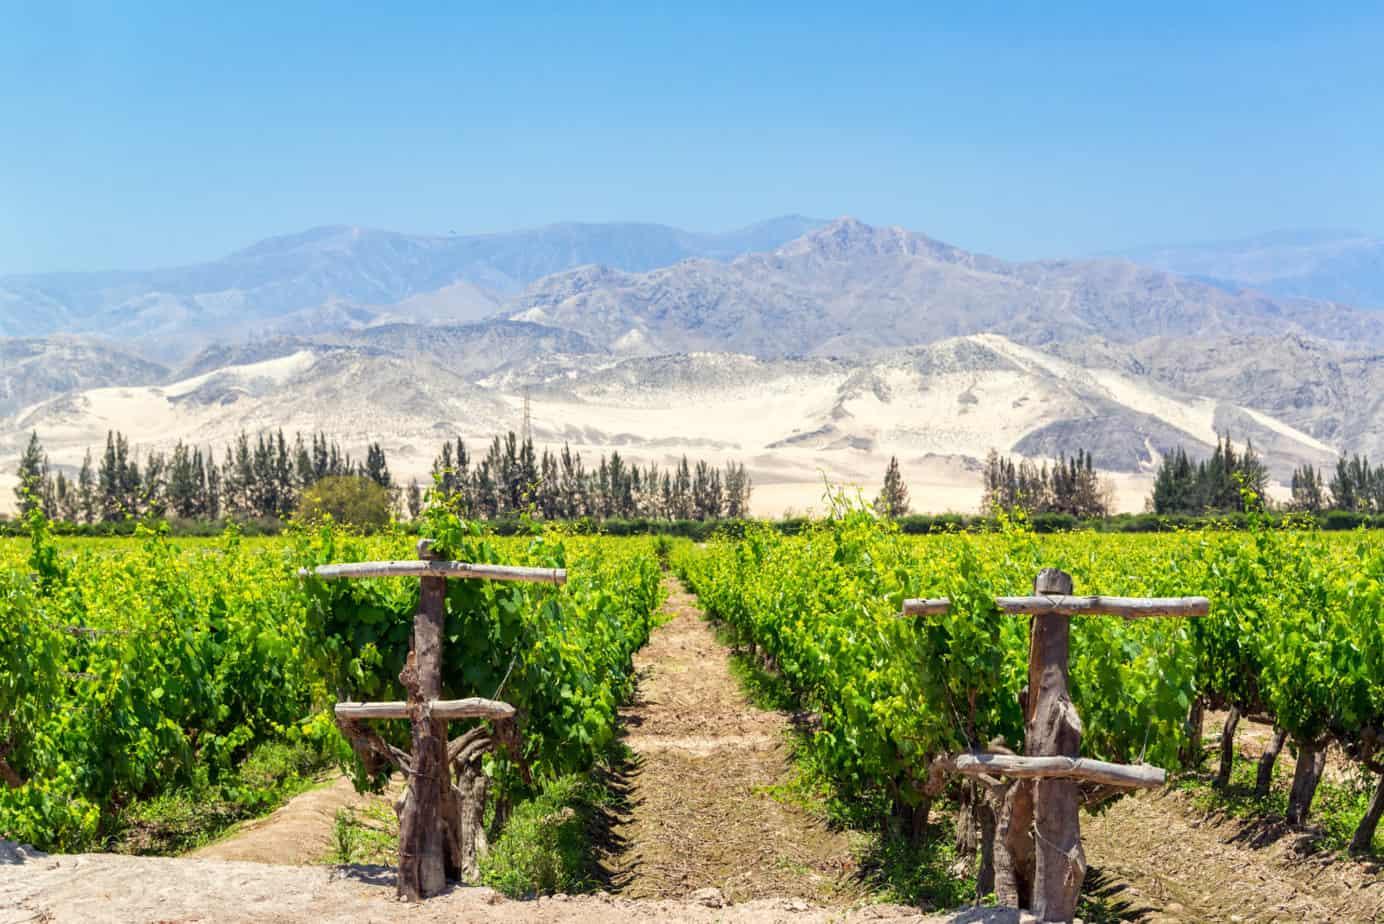 Lush Pisco Wijngaard in Peru